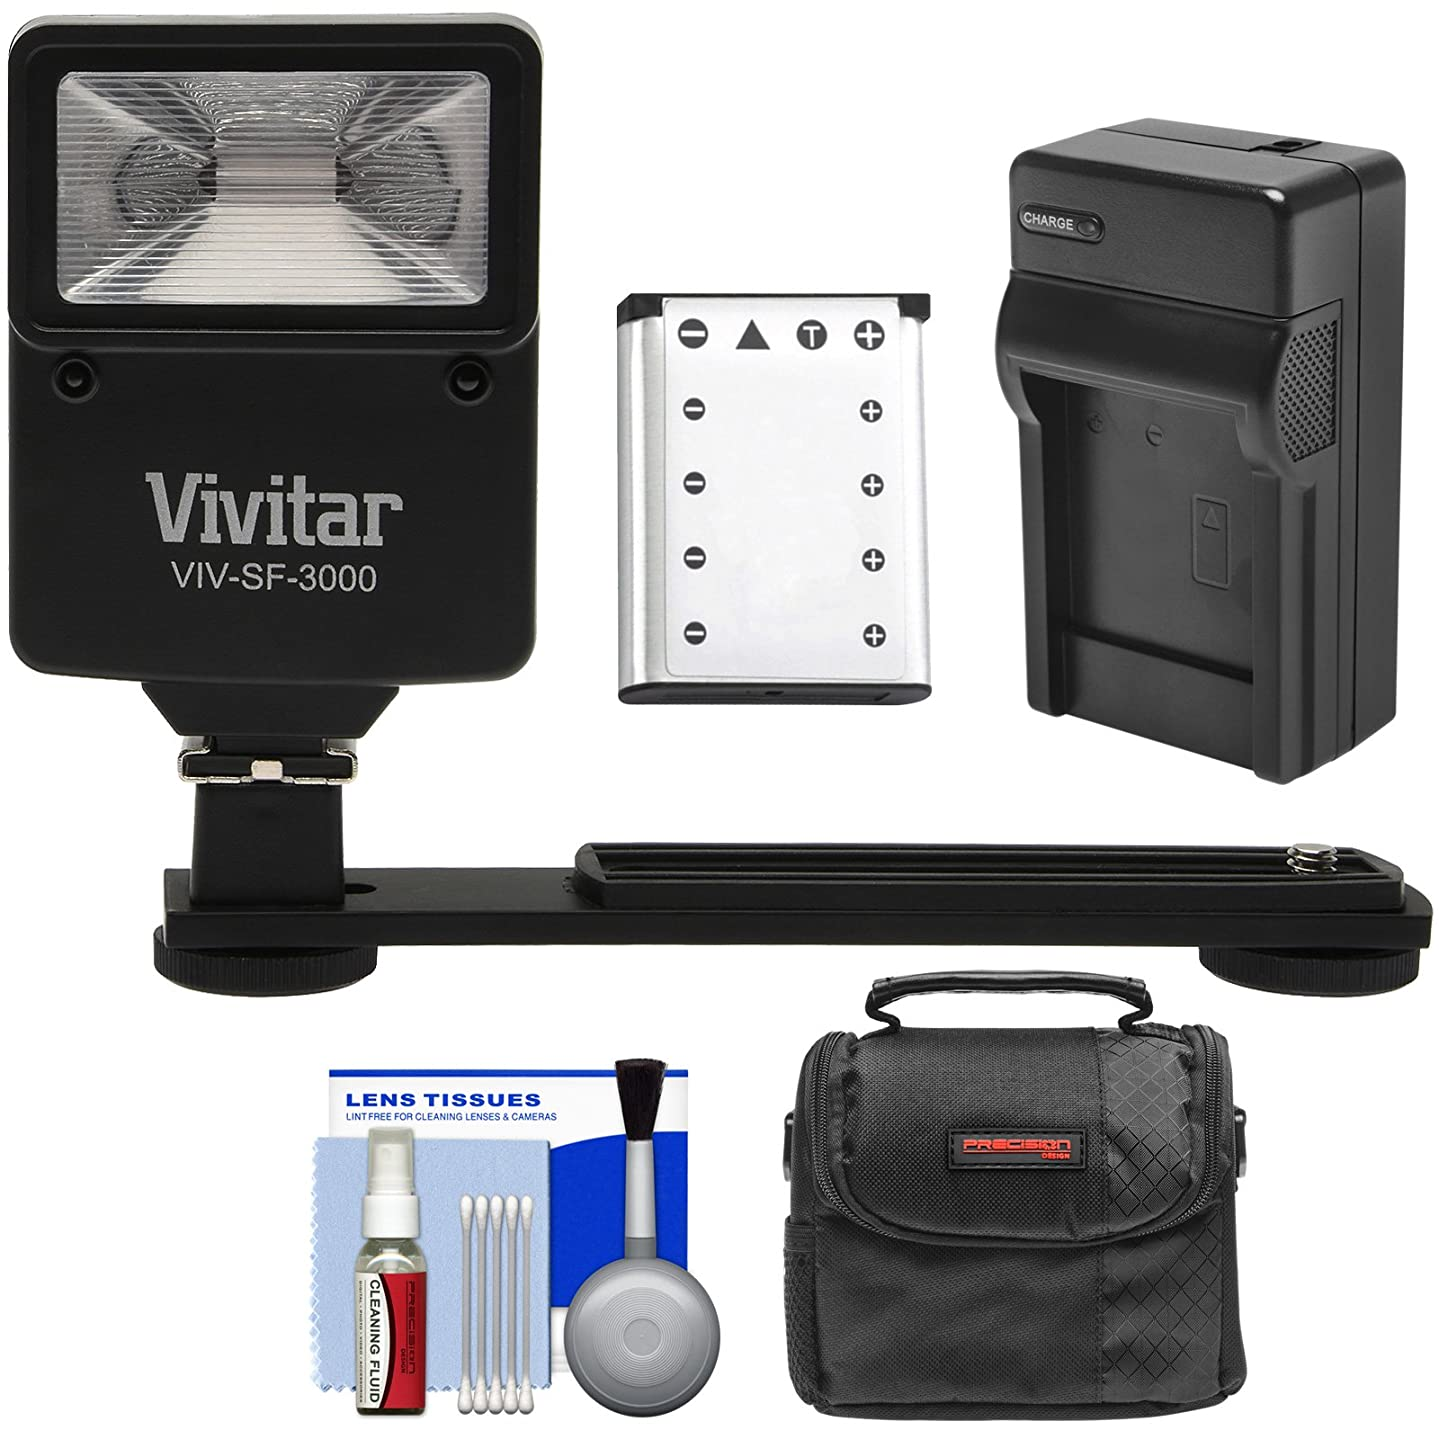 Essentials Bundle for Kodak PixPro FZ51, FZ53 with LB-012 Battery + Charger + Case + Flash & Bracket + Kit